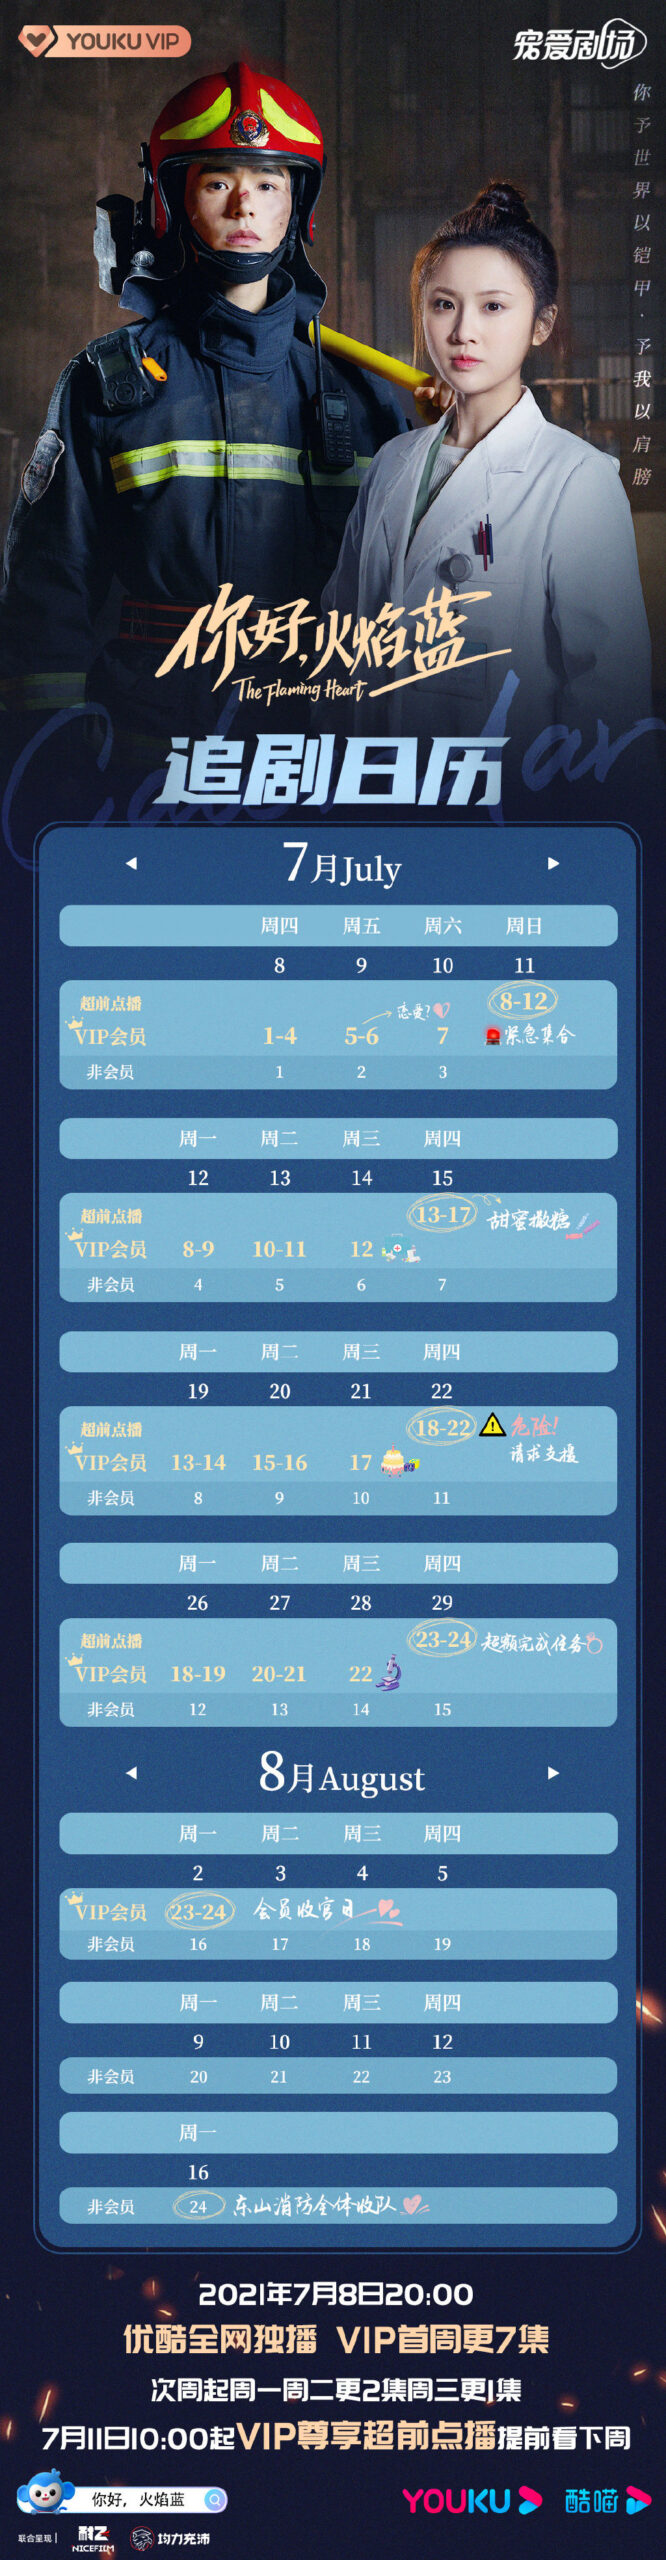 The Flaming Heart Chinese Drama Airing Calendar